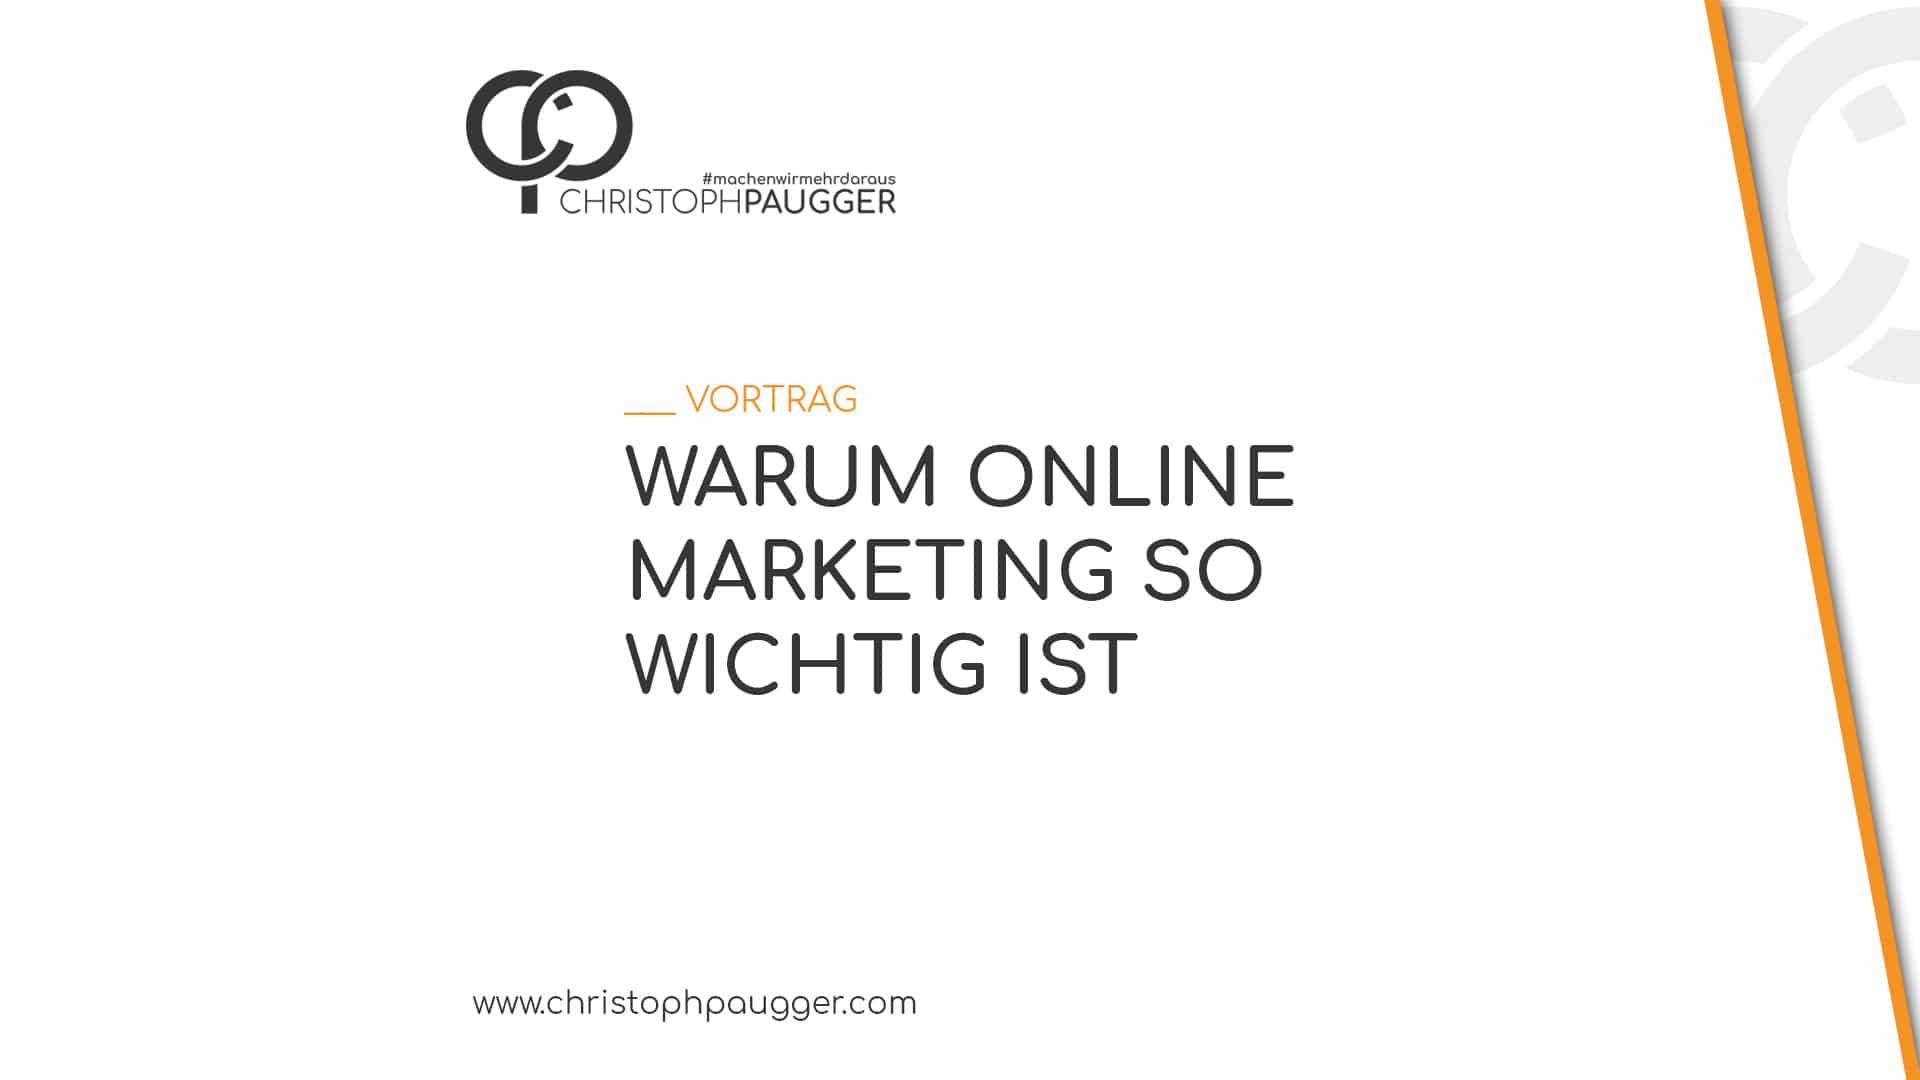 Votrag Online Marketing